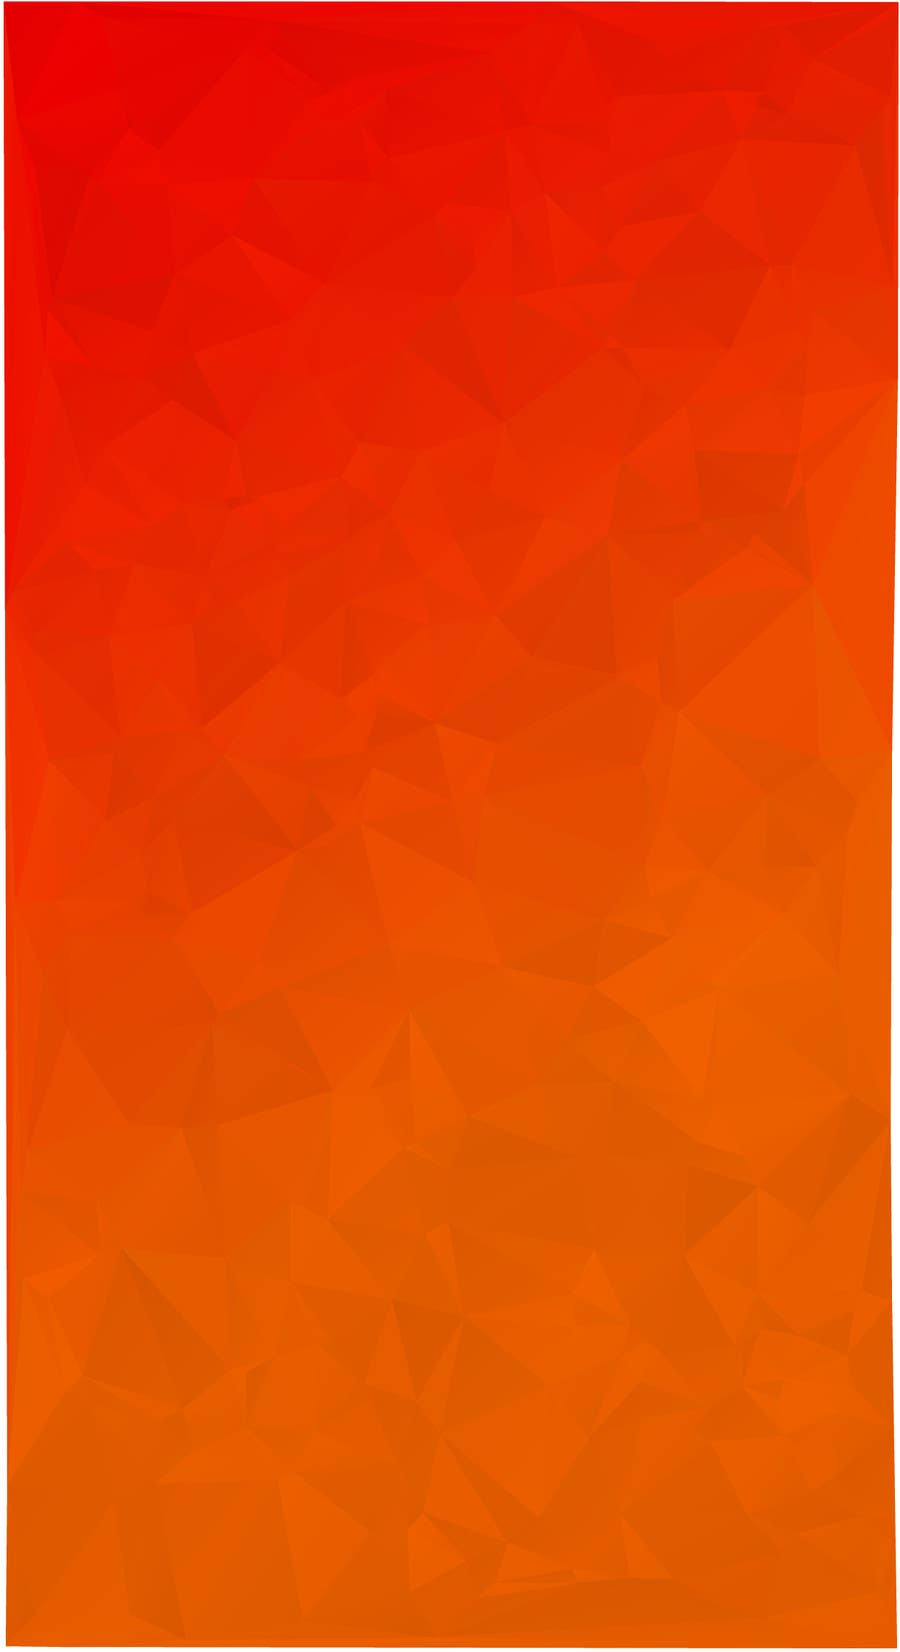 Konkurrenceindlæg #                                        8                                      for                                         Background image: graphic/geometric design needed